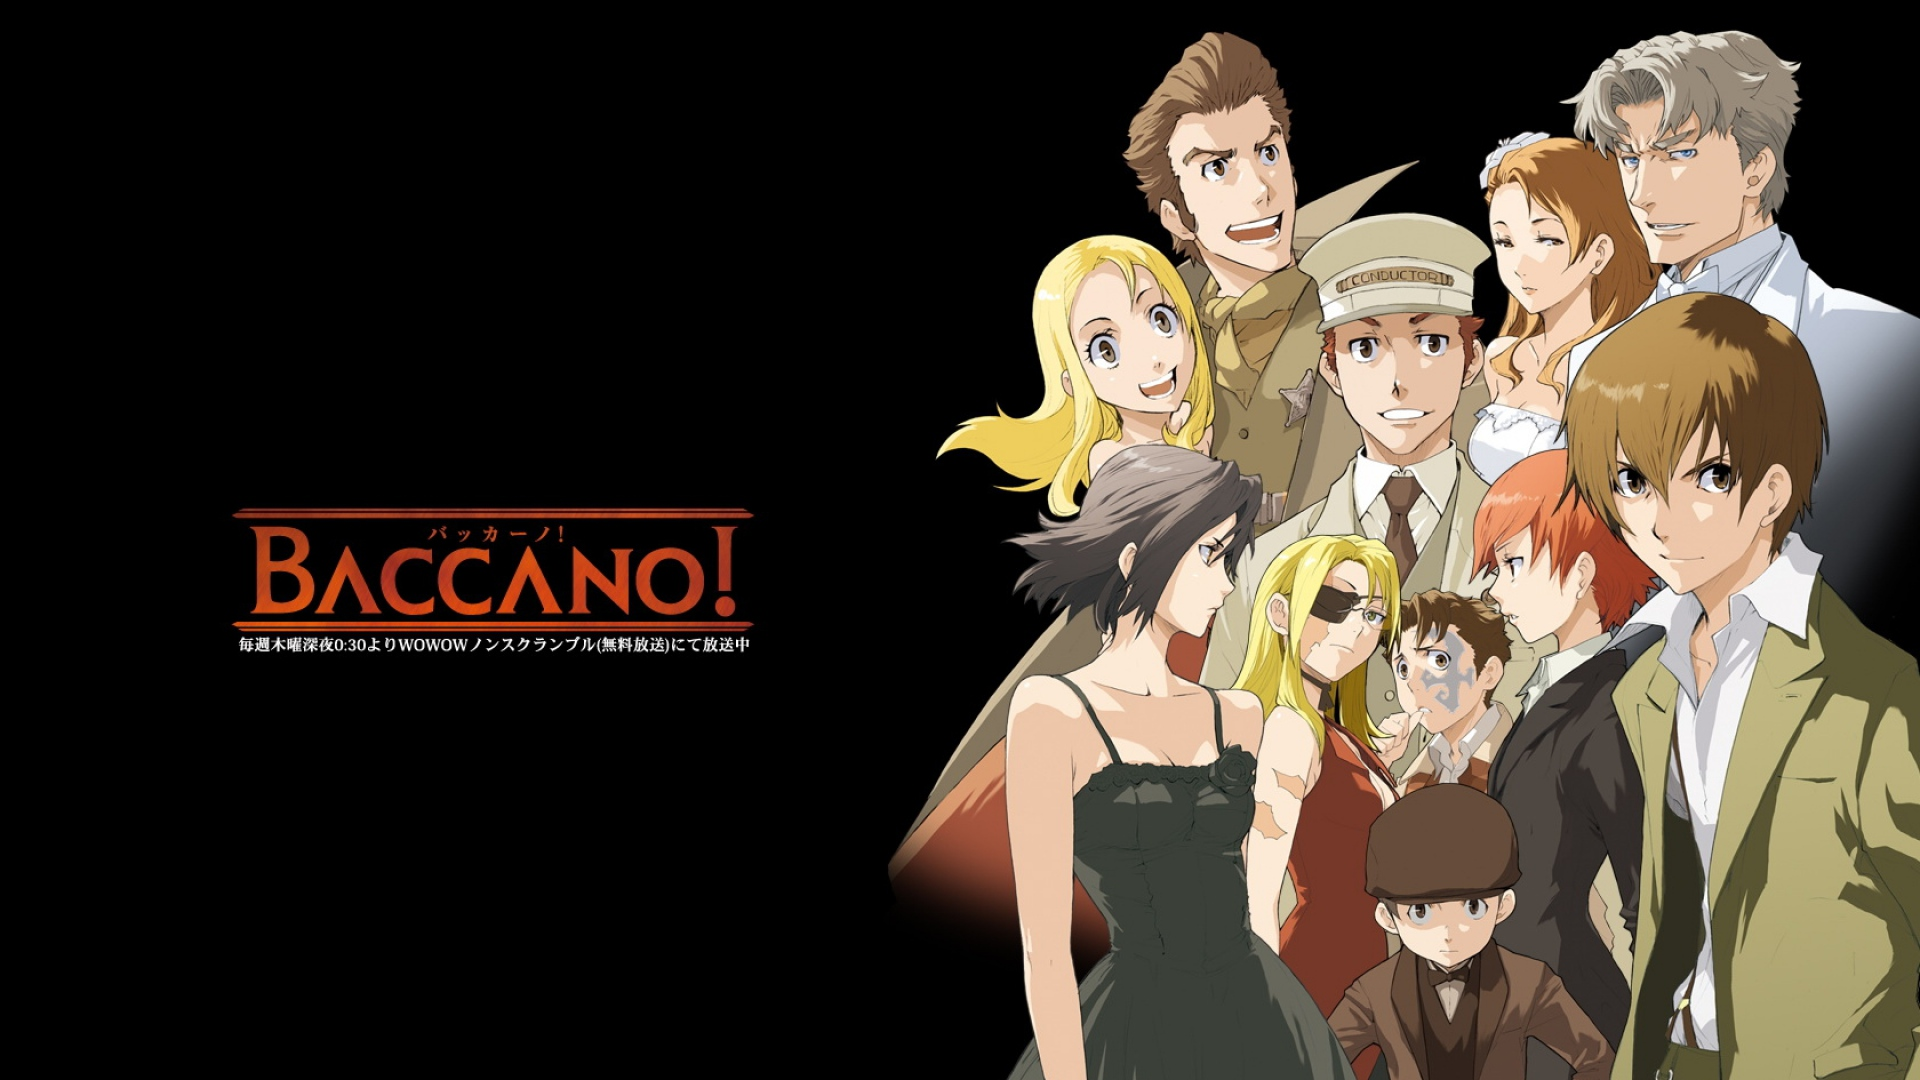 baccano, crowd, emotion